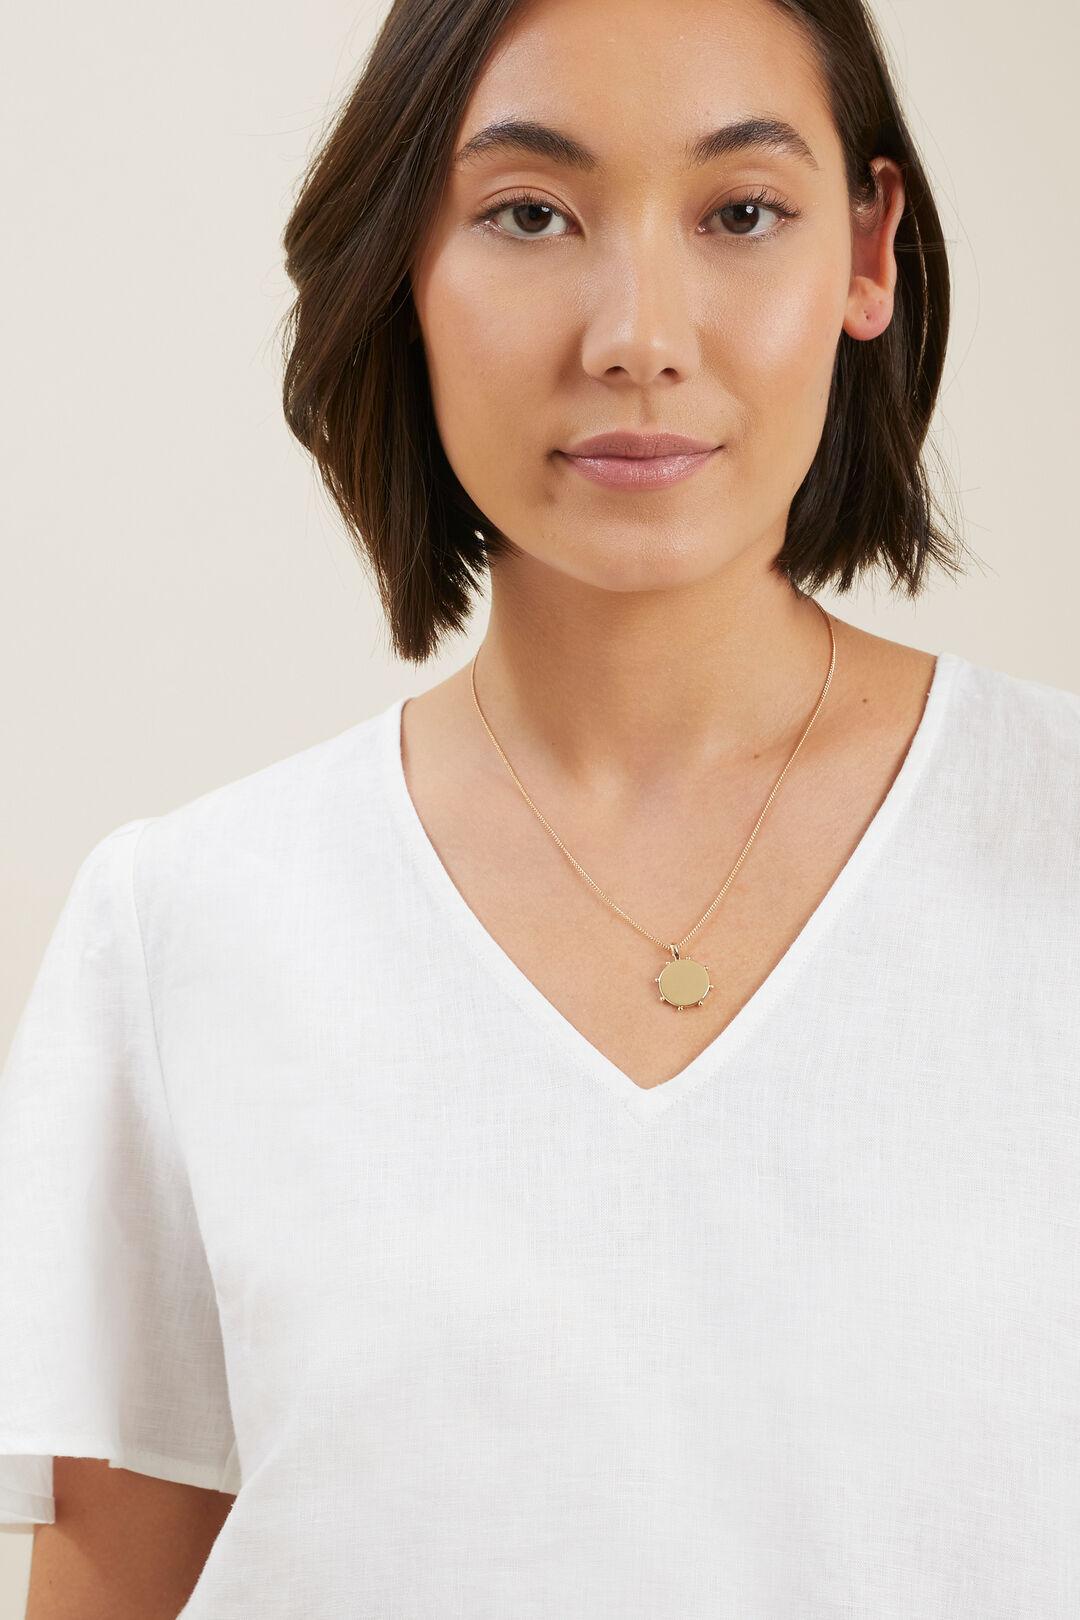 Studded Pendant Necklace  GOLD  hi-res